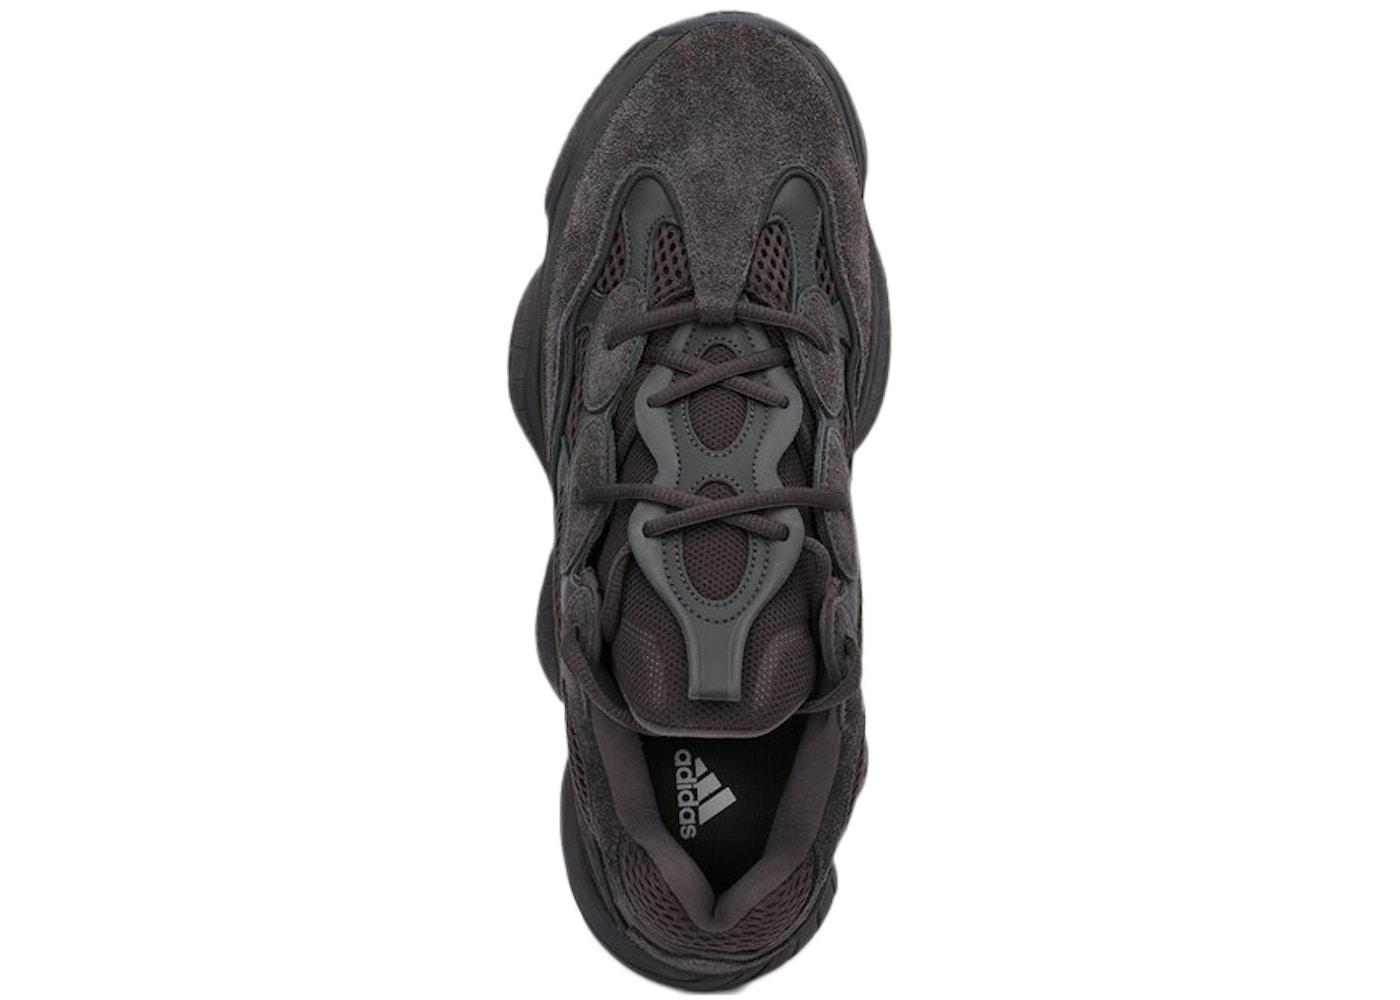 official photos 98fe8 da875 adidas Yeezy 500 Shadow Black (Friends & Family) - Sneakers